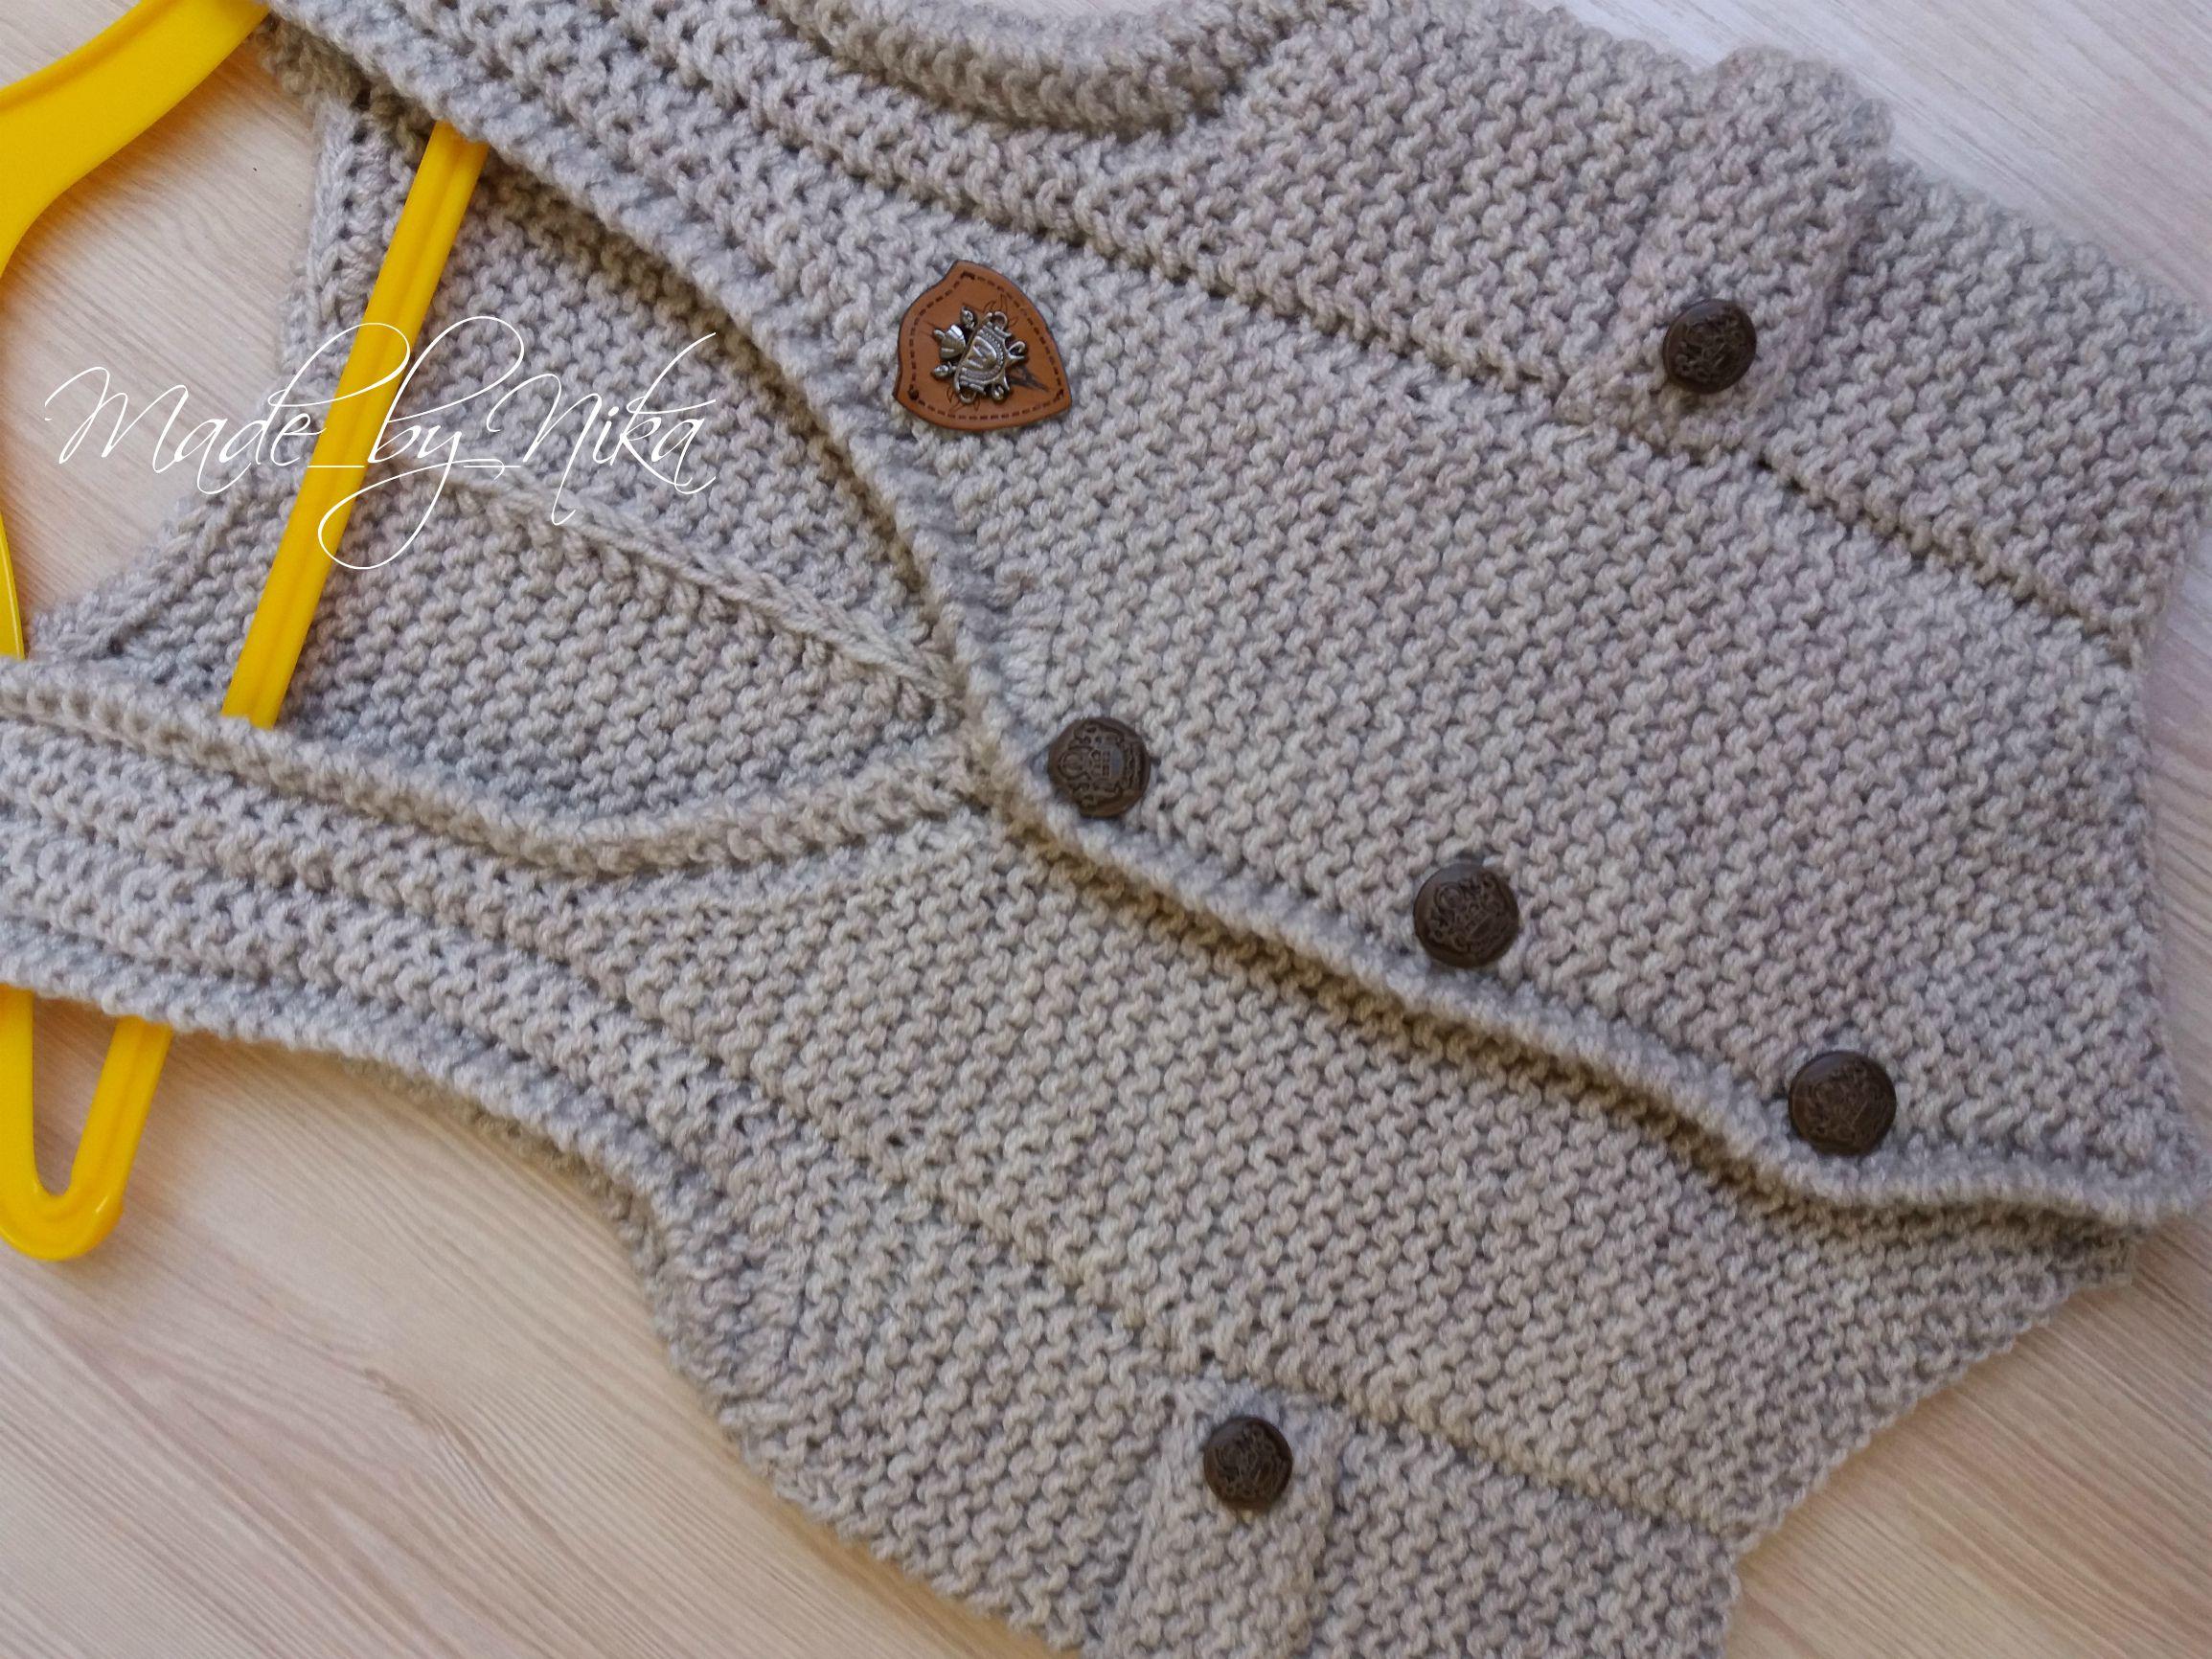 жилетка работа жакет одежда handmade безрукавка стиль ручная заказ вязание мода made_by_nika